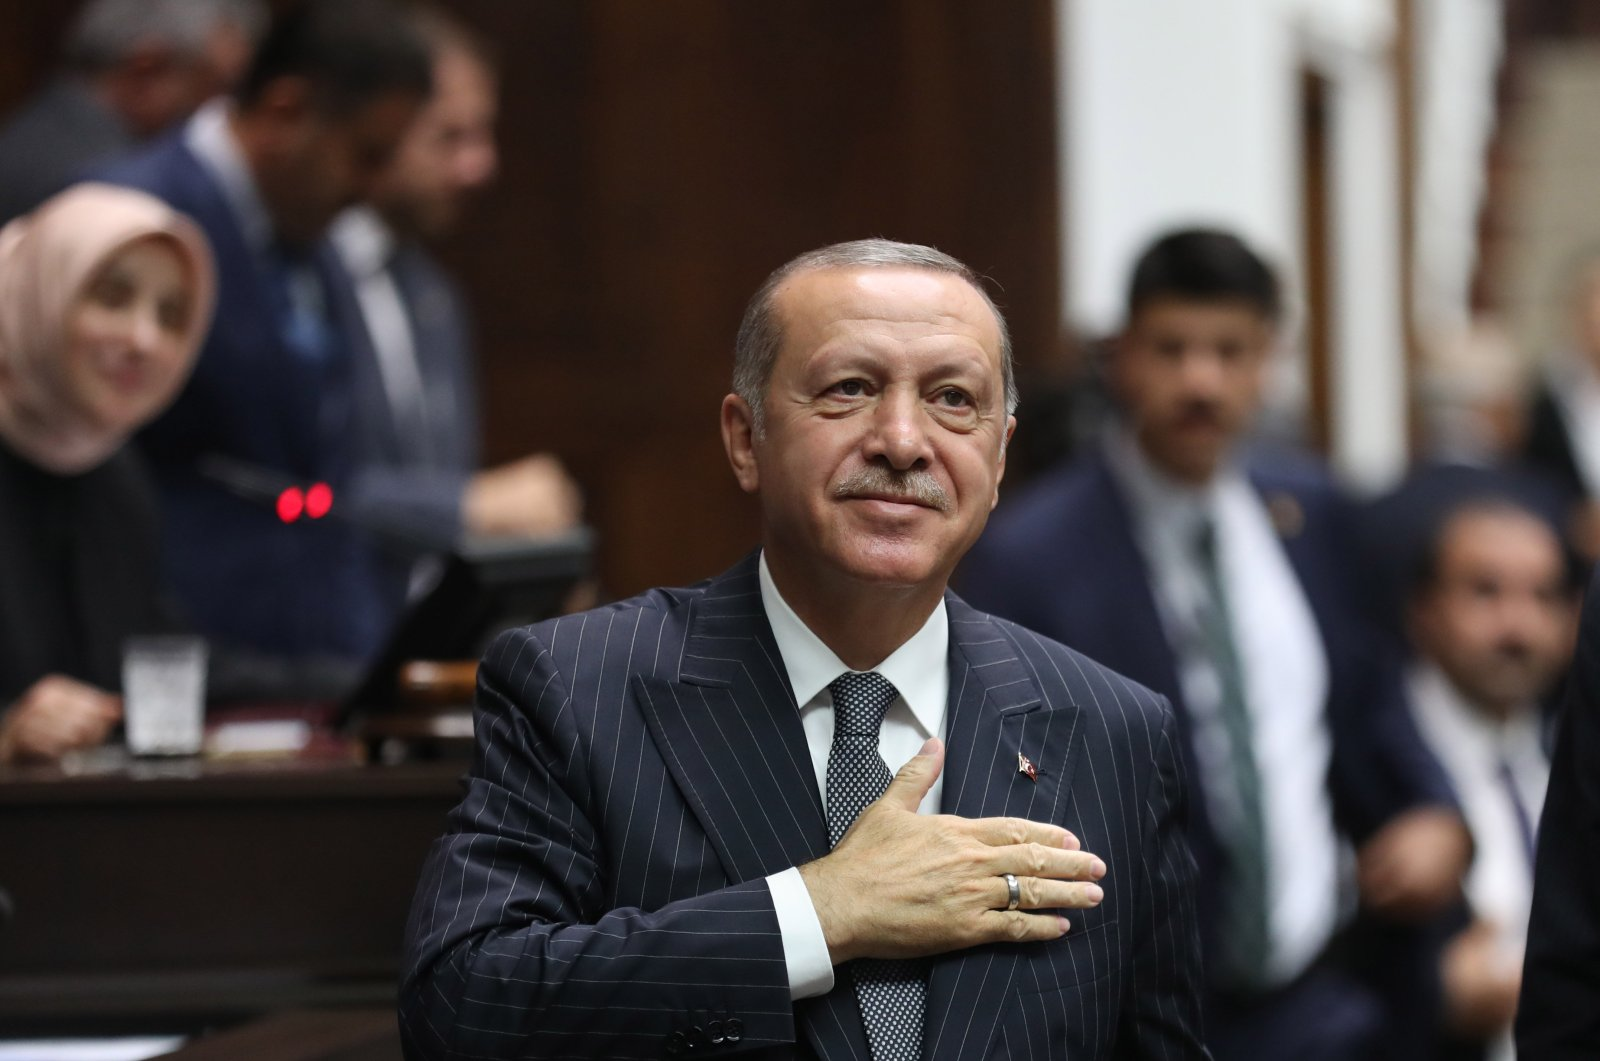 President Recep Tayyip Erdoğan salutes his party members during a parliamentary group meeting in Ankara, Oct.2, 2018. (PHOTO BY ALI EKEYILMAZ)